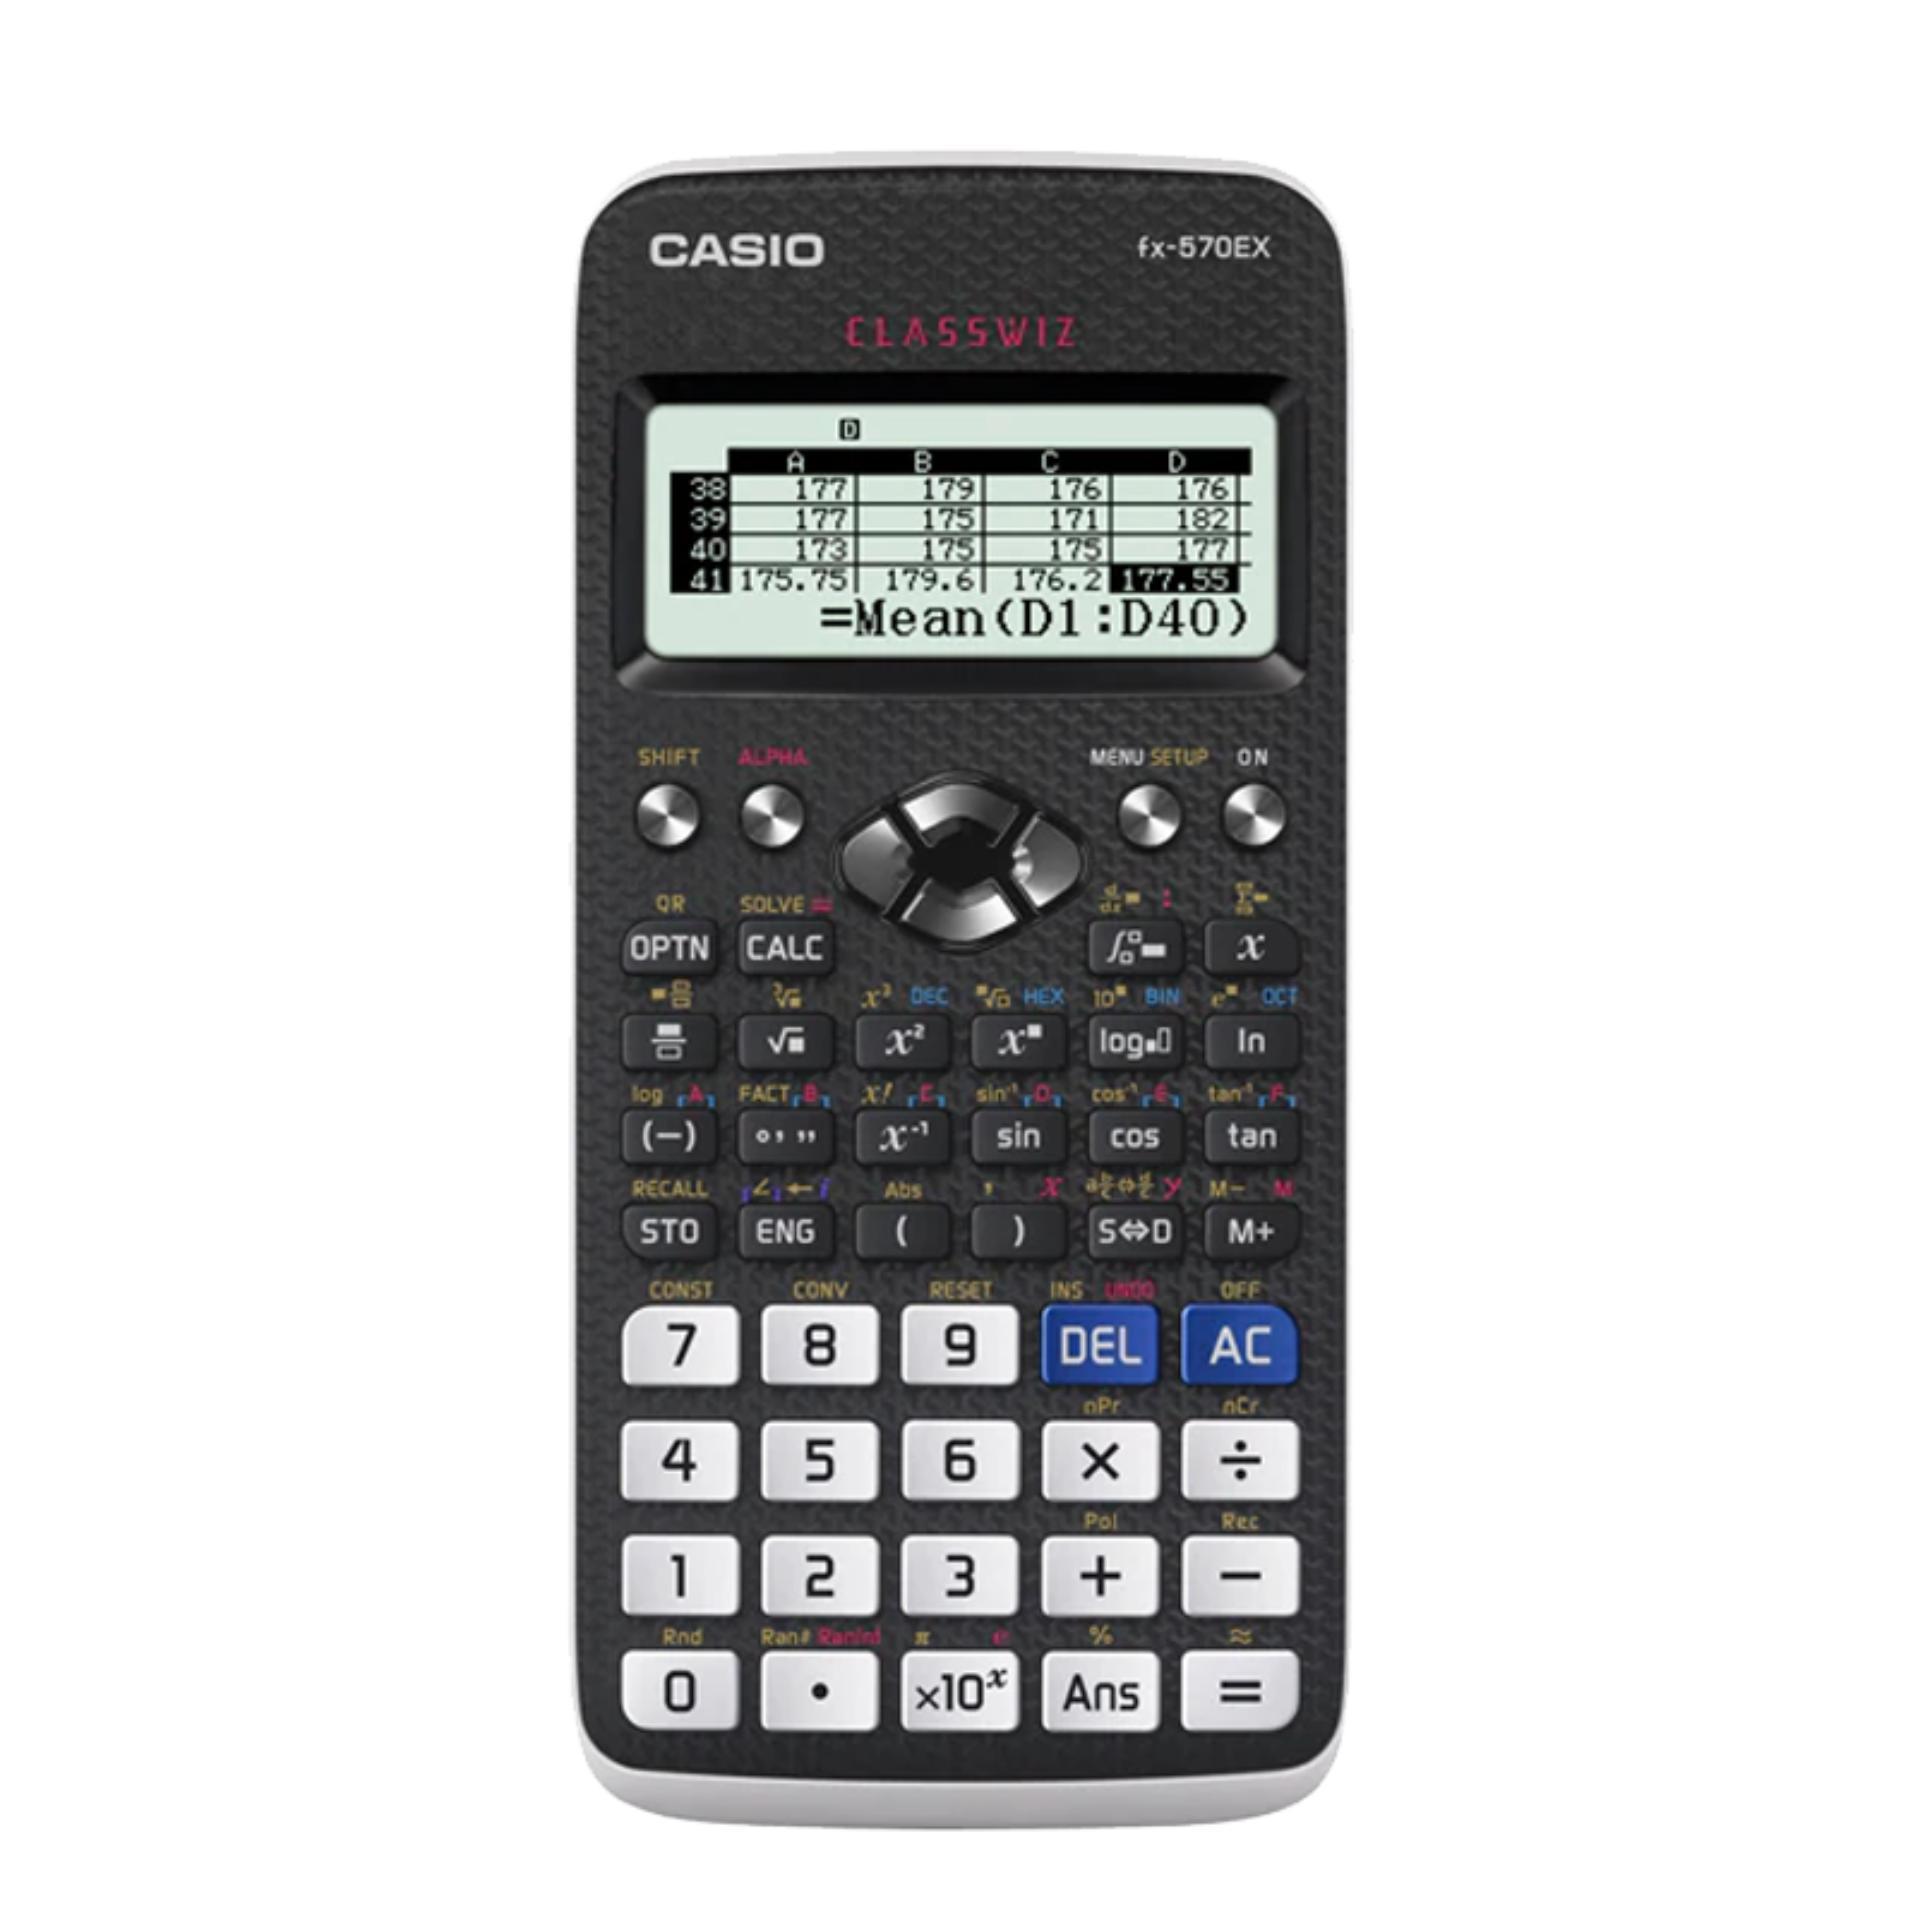 Mua CASIO FX 570EX